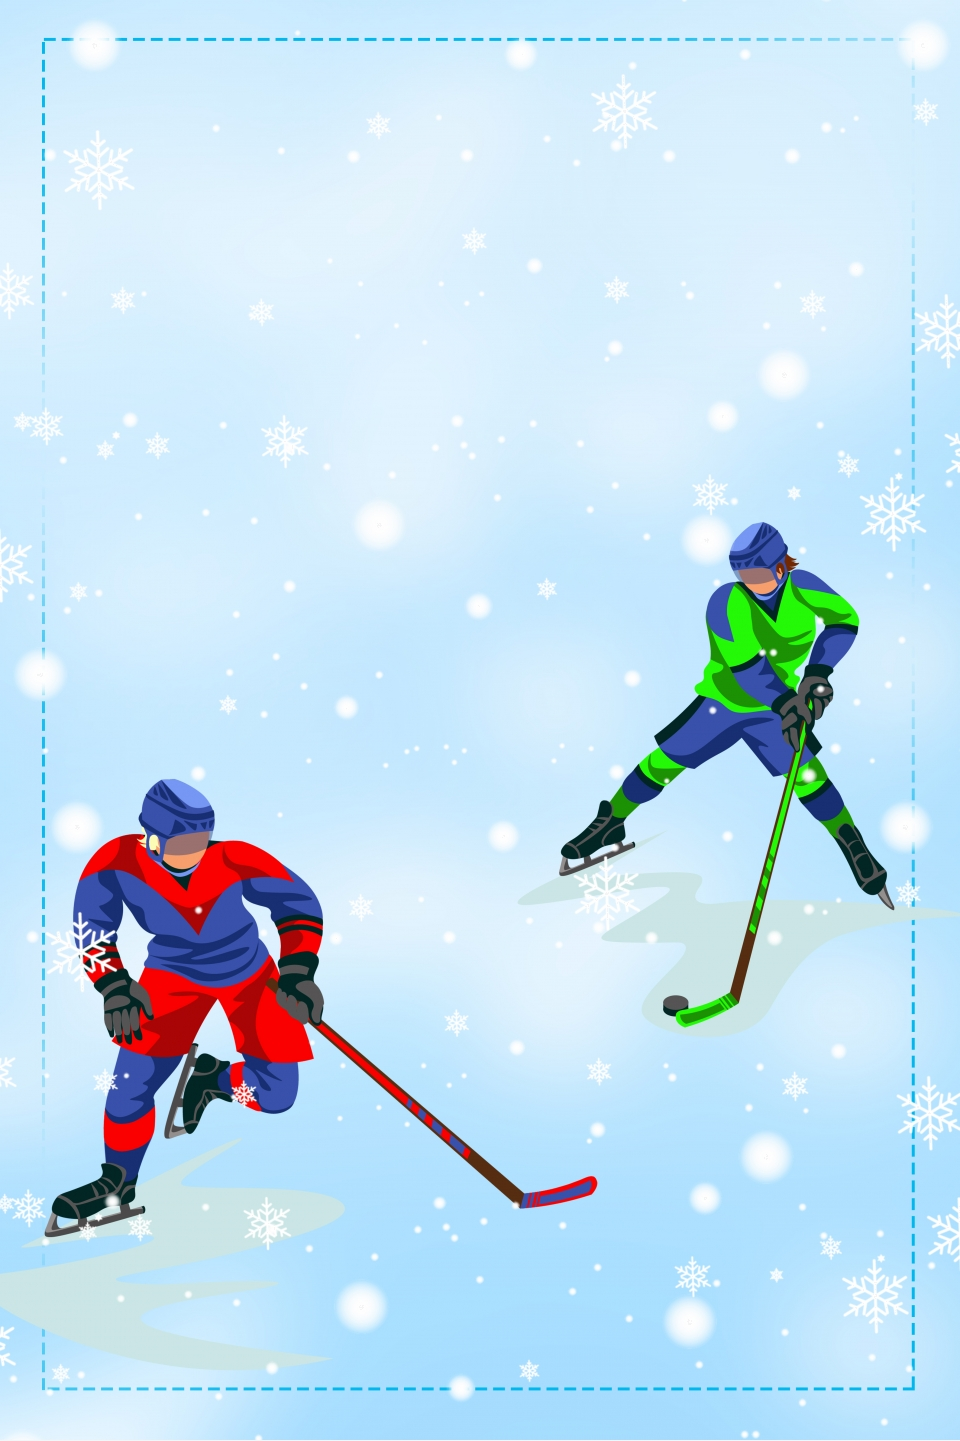 Картинки хоккея для афиши